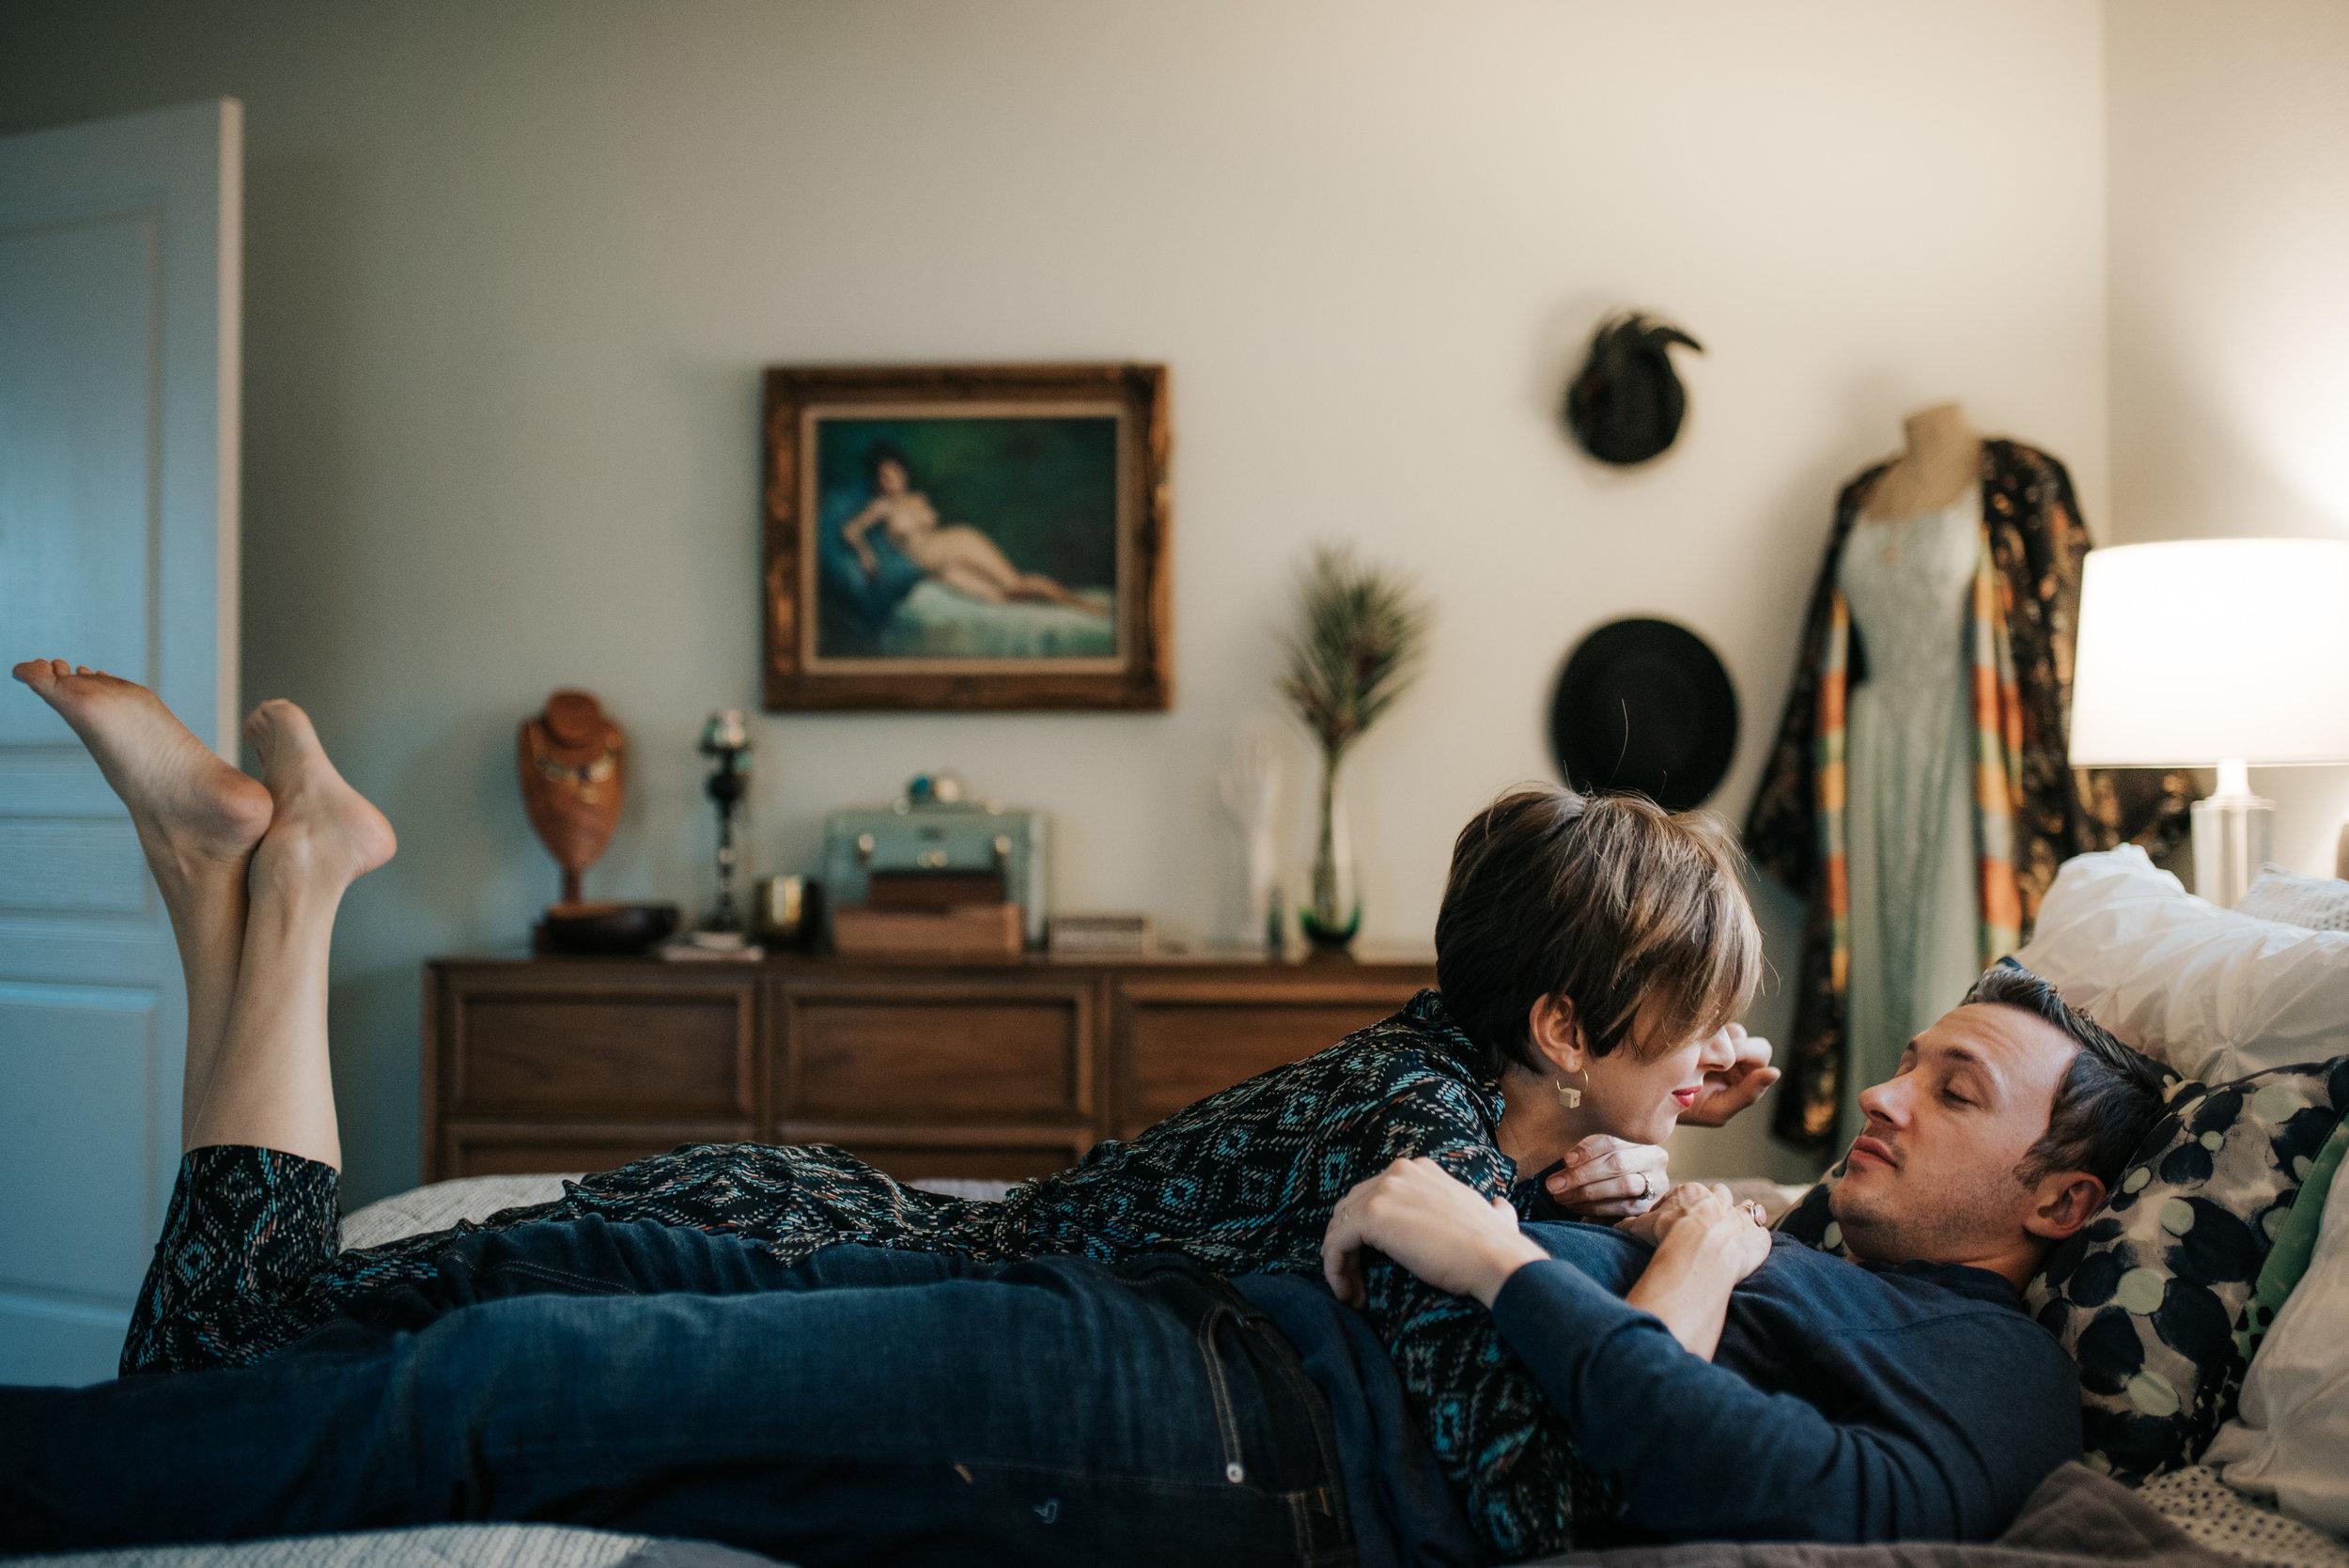 carissa-spencer-mid-century-editorial-in-home-couple-session-orlando-florida-319.jpg